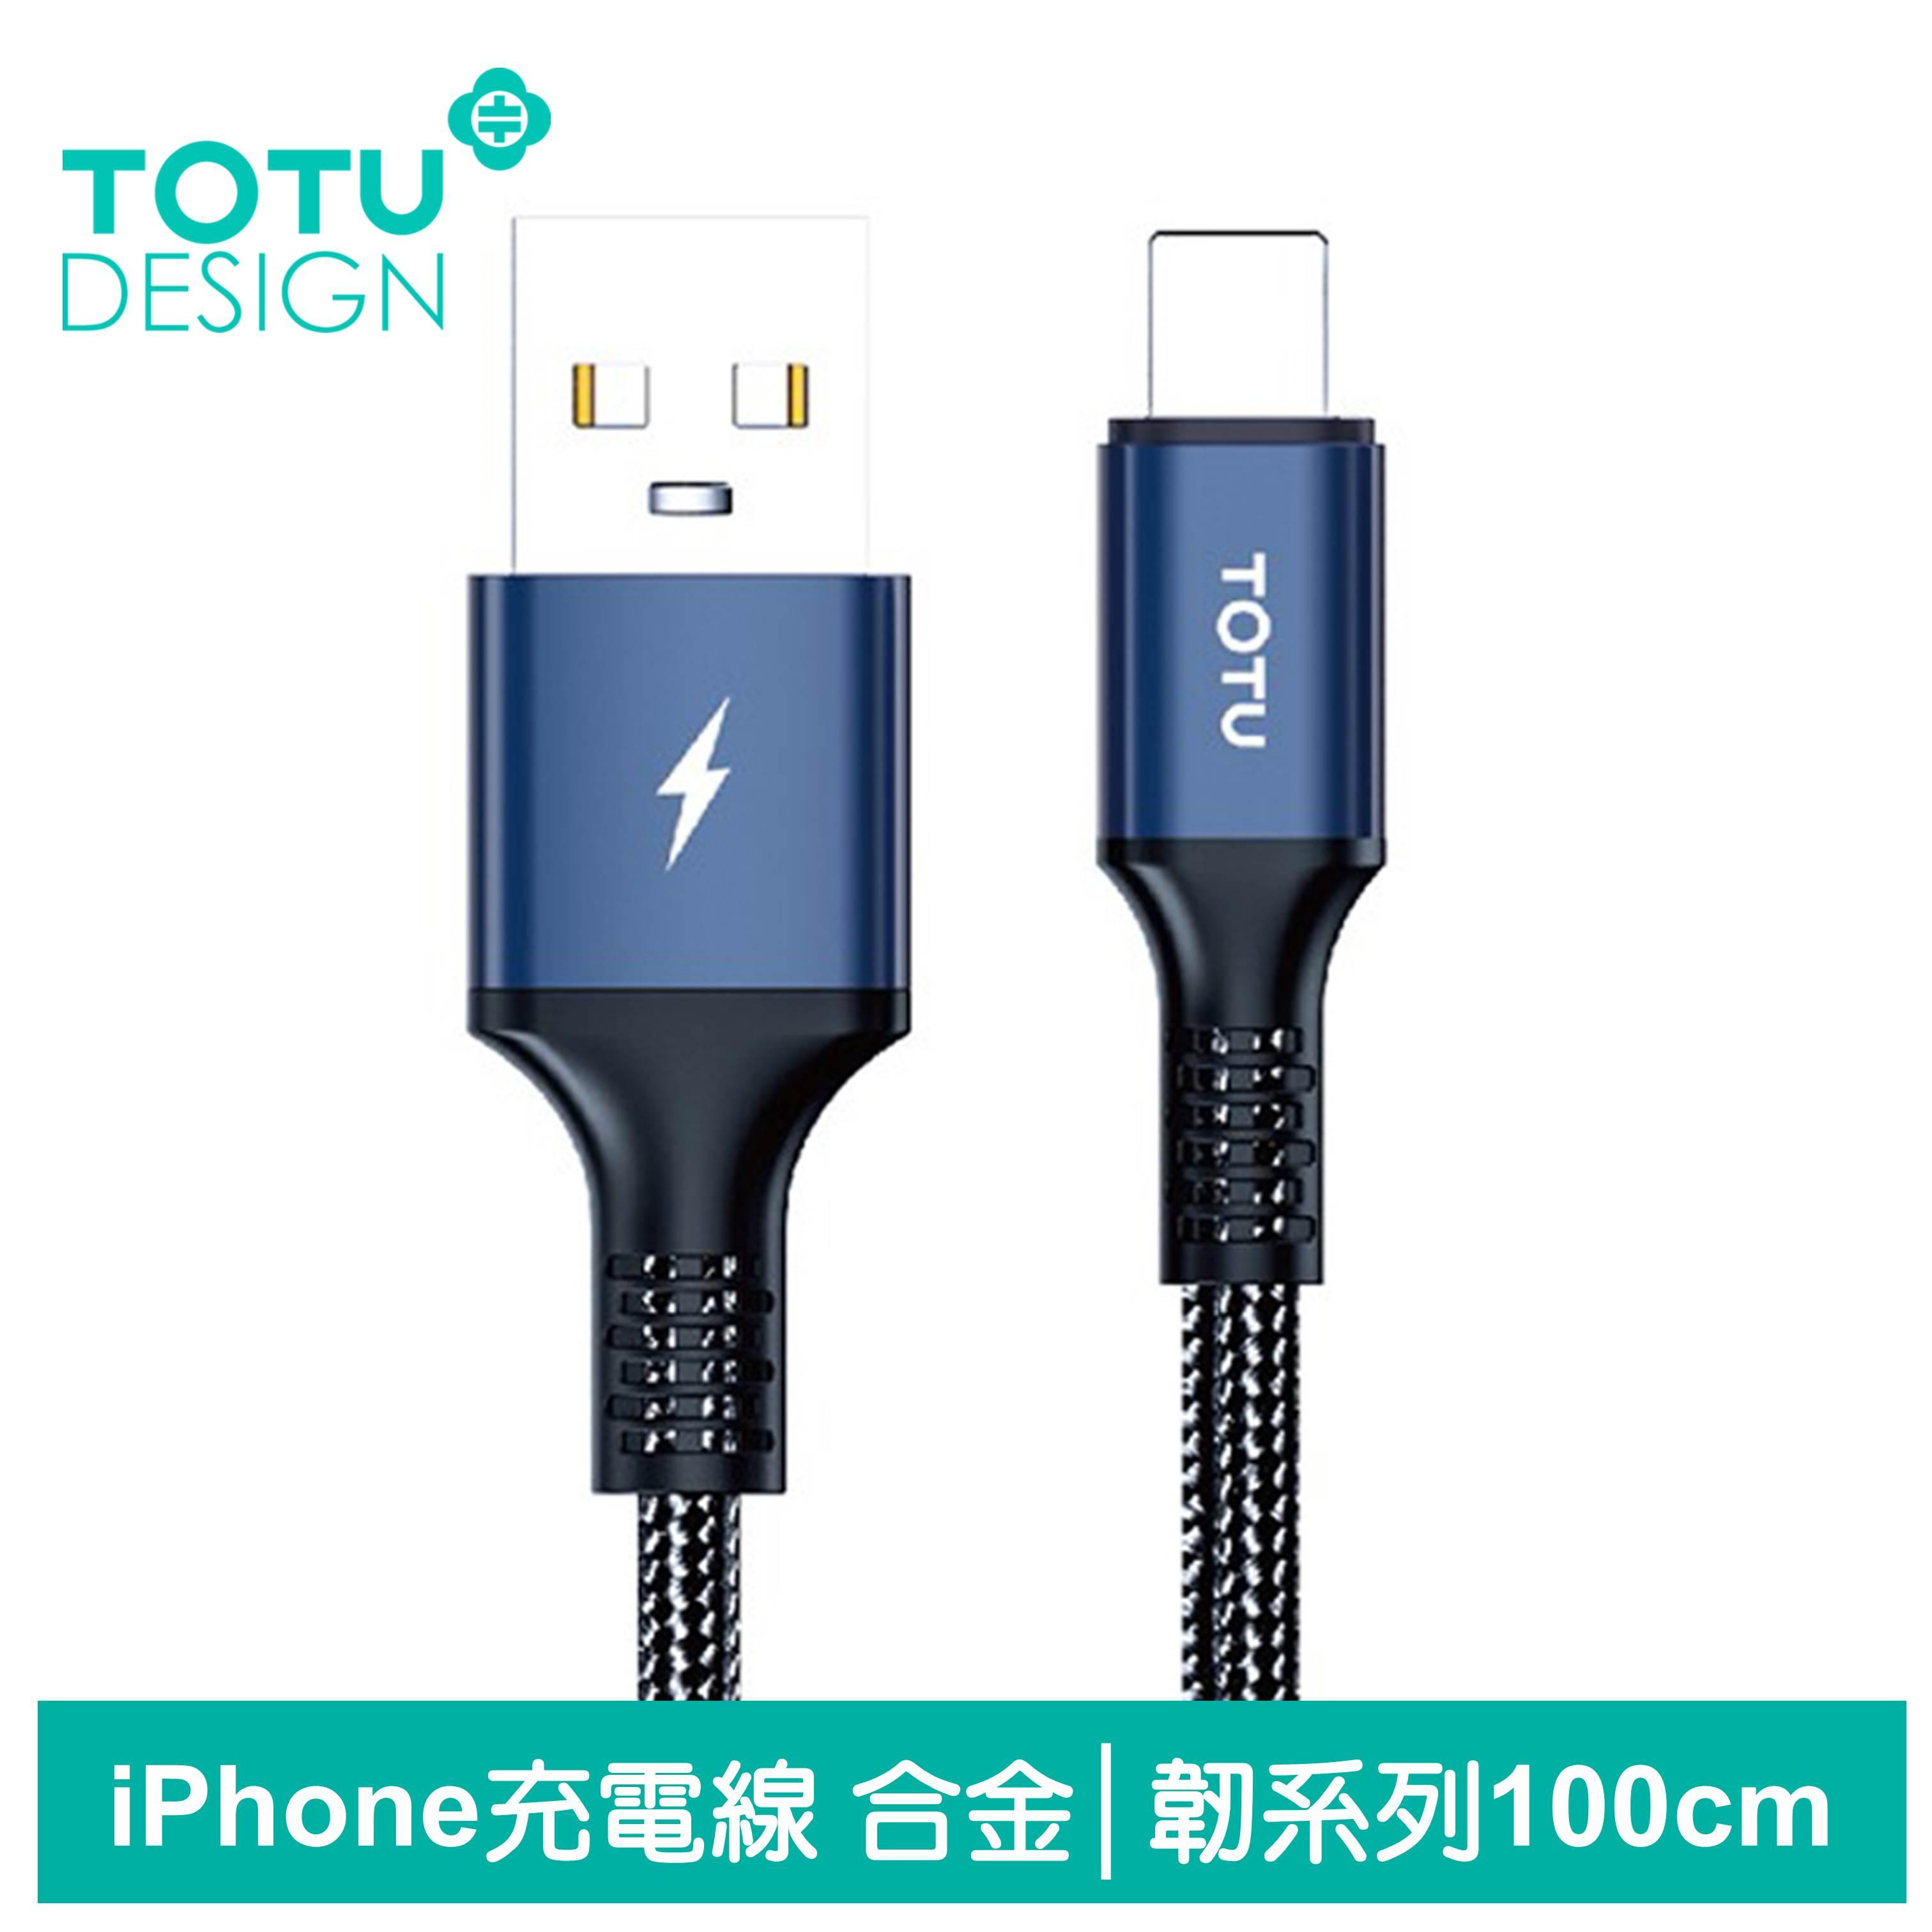 TOTU台灣官方 Lightning/iPhone充電線傳輸線快充線編織線 2A快充 韌系列 100cm 藍色